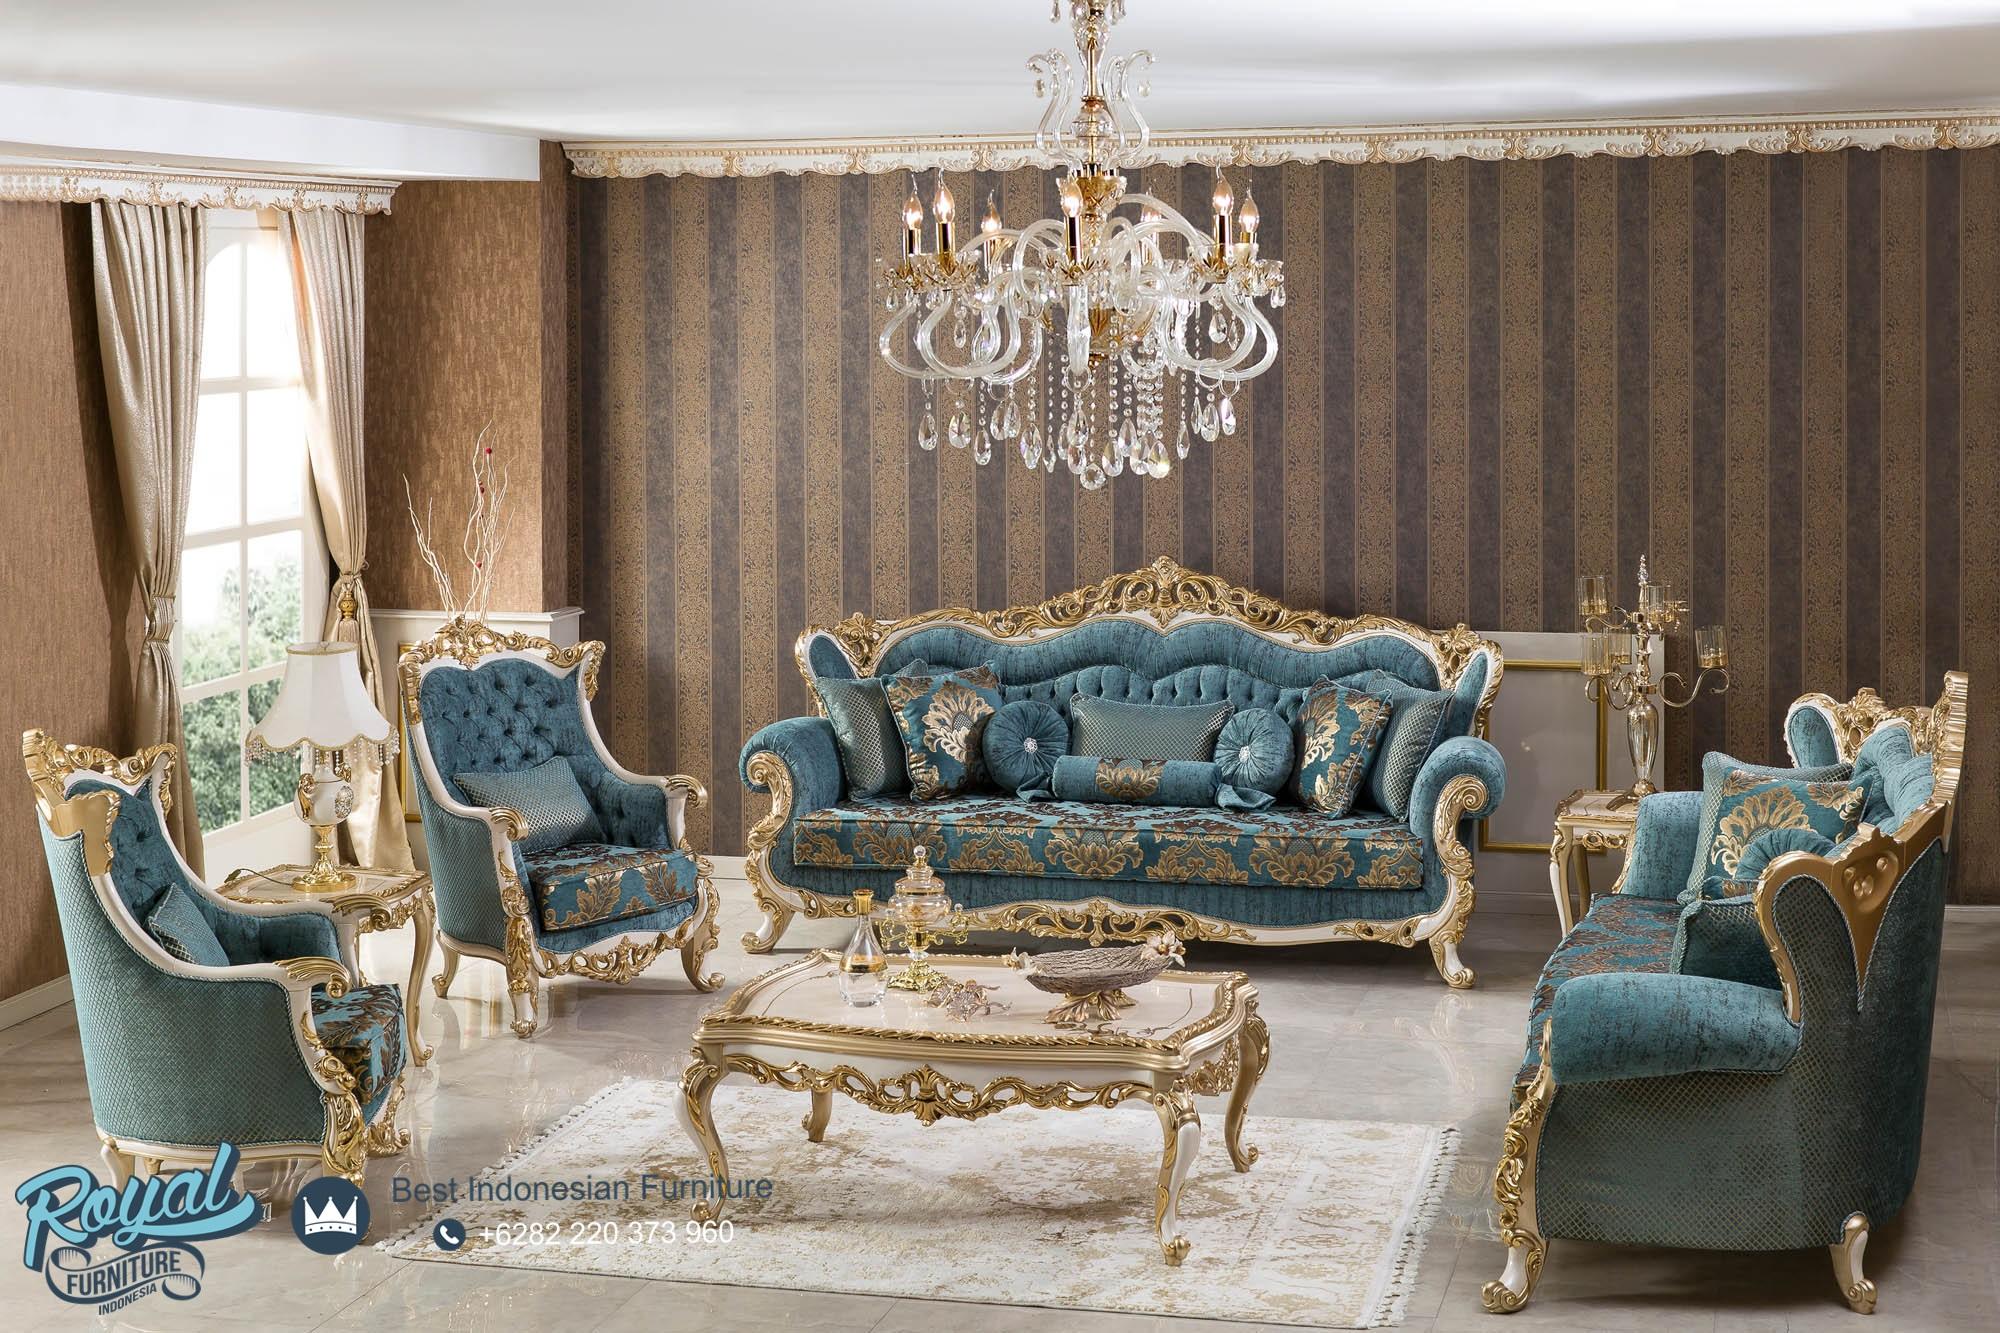 Set Kursi Sofa Tamu Jepara Terbaru Luxury, kursi tamu jepara, furniture sofa tamu, set sofa tamu mewah, sofa mewah modern, kursi tamu mewah minimalis, kursi tamu mewah modern, kursi mewah ruang tamu, kursi tamu mewah kualitas terbaik, sofa tamu mewah terbaru, model kursi sofa ruang tamu, harga sofa tamu mewah, sofa tamu klasik, sofa tamu mewah ukiran, kursi tamu mewah, model sofa tamu mewah terbaru, desain sofa ruang tamu klasik mewah, set sofa tamu terbaru 2019, mebel jepara, furniture jepara, royal furniture